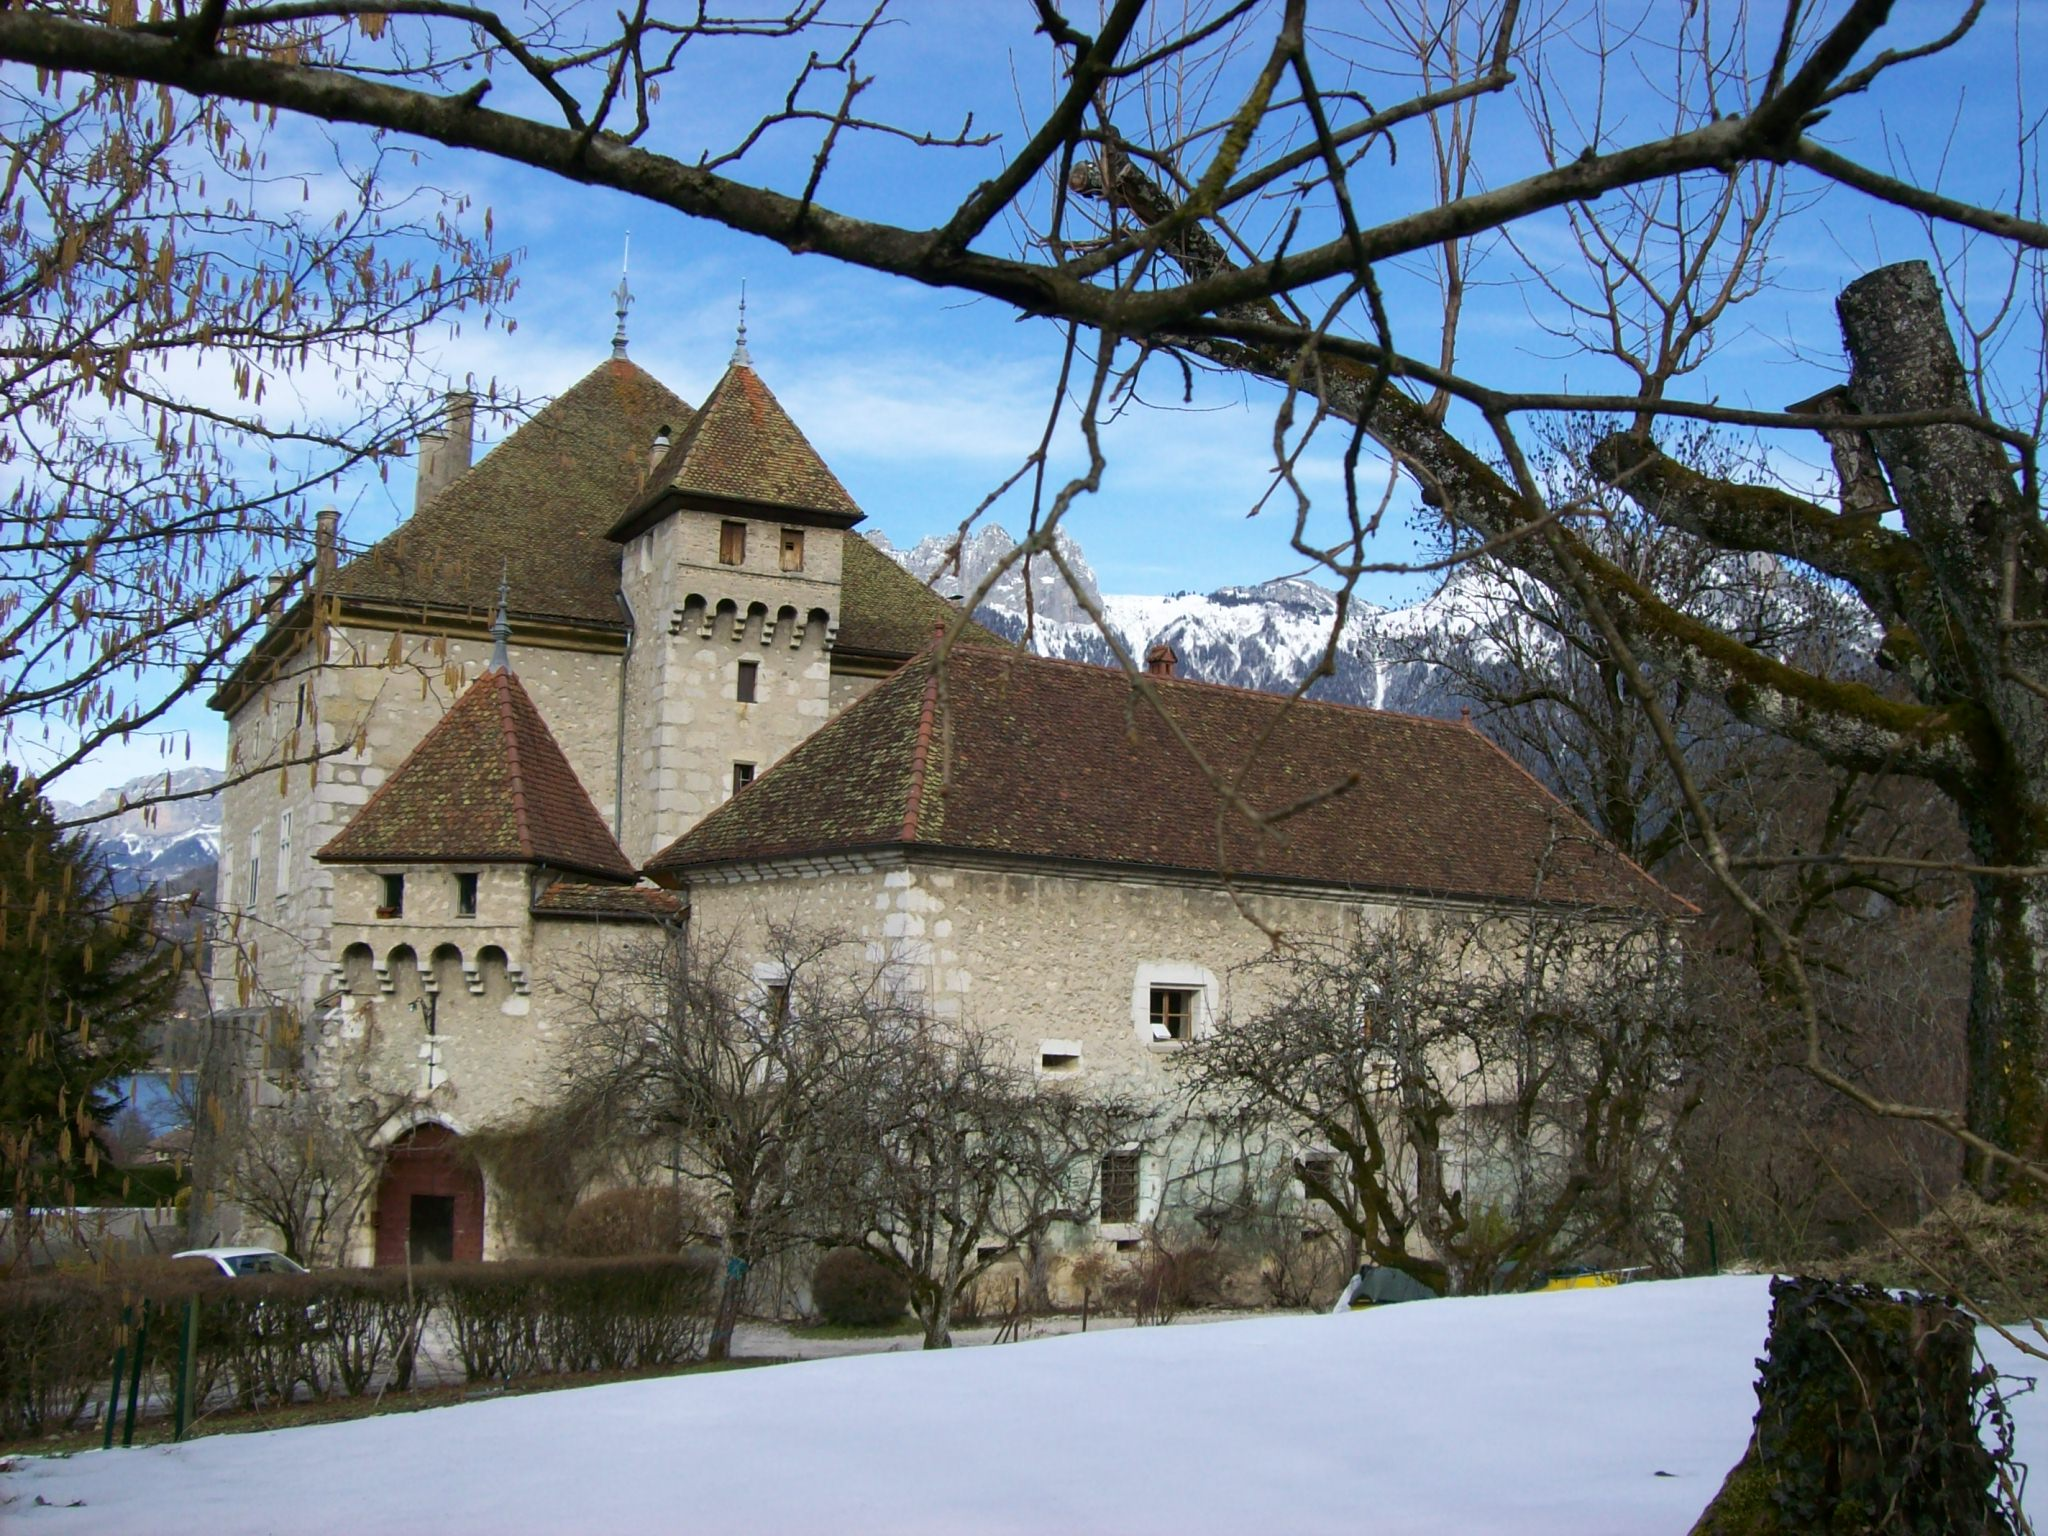 Chateau du Dhere